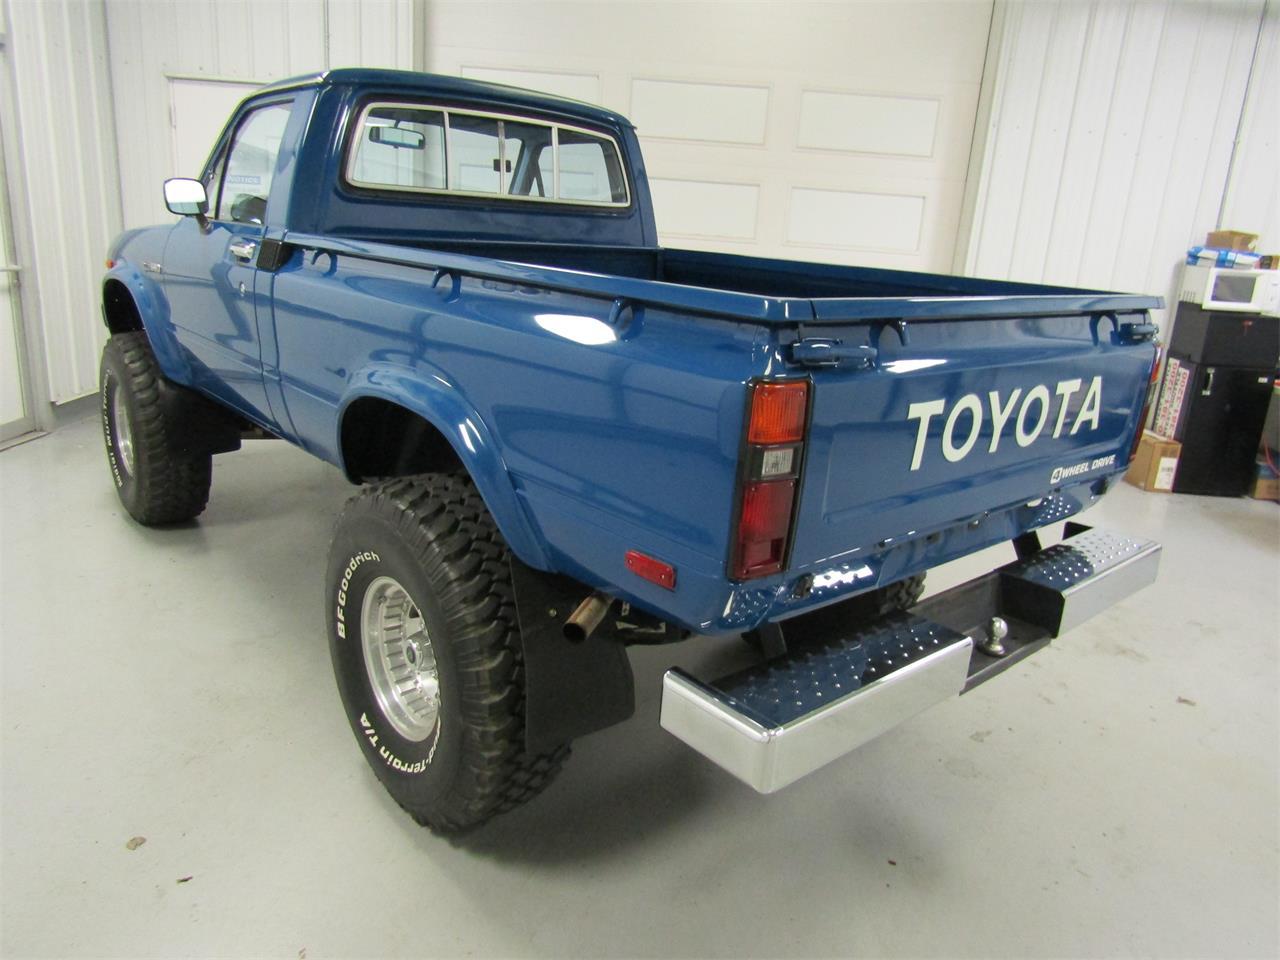 Toyota Dealers In Az >> 1980 Toyota HiLux for Sale   ClassicCars.com   CC-1090103